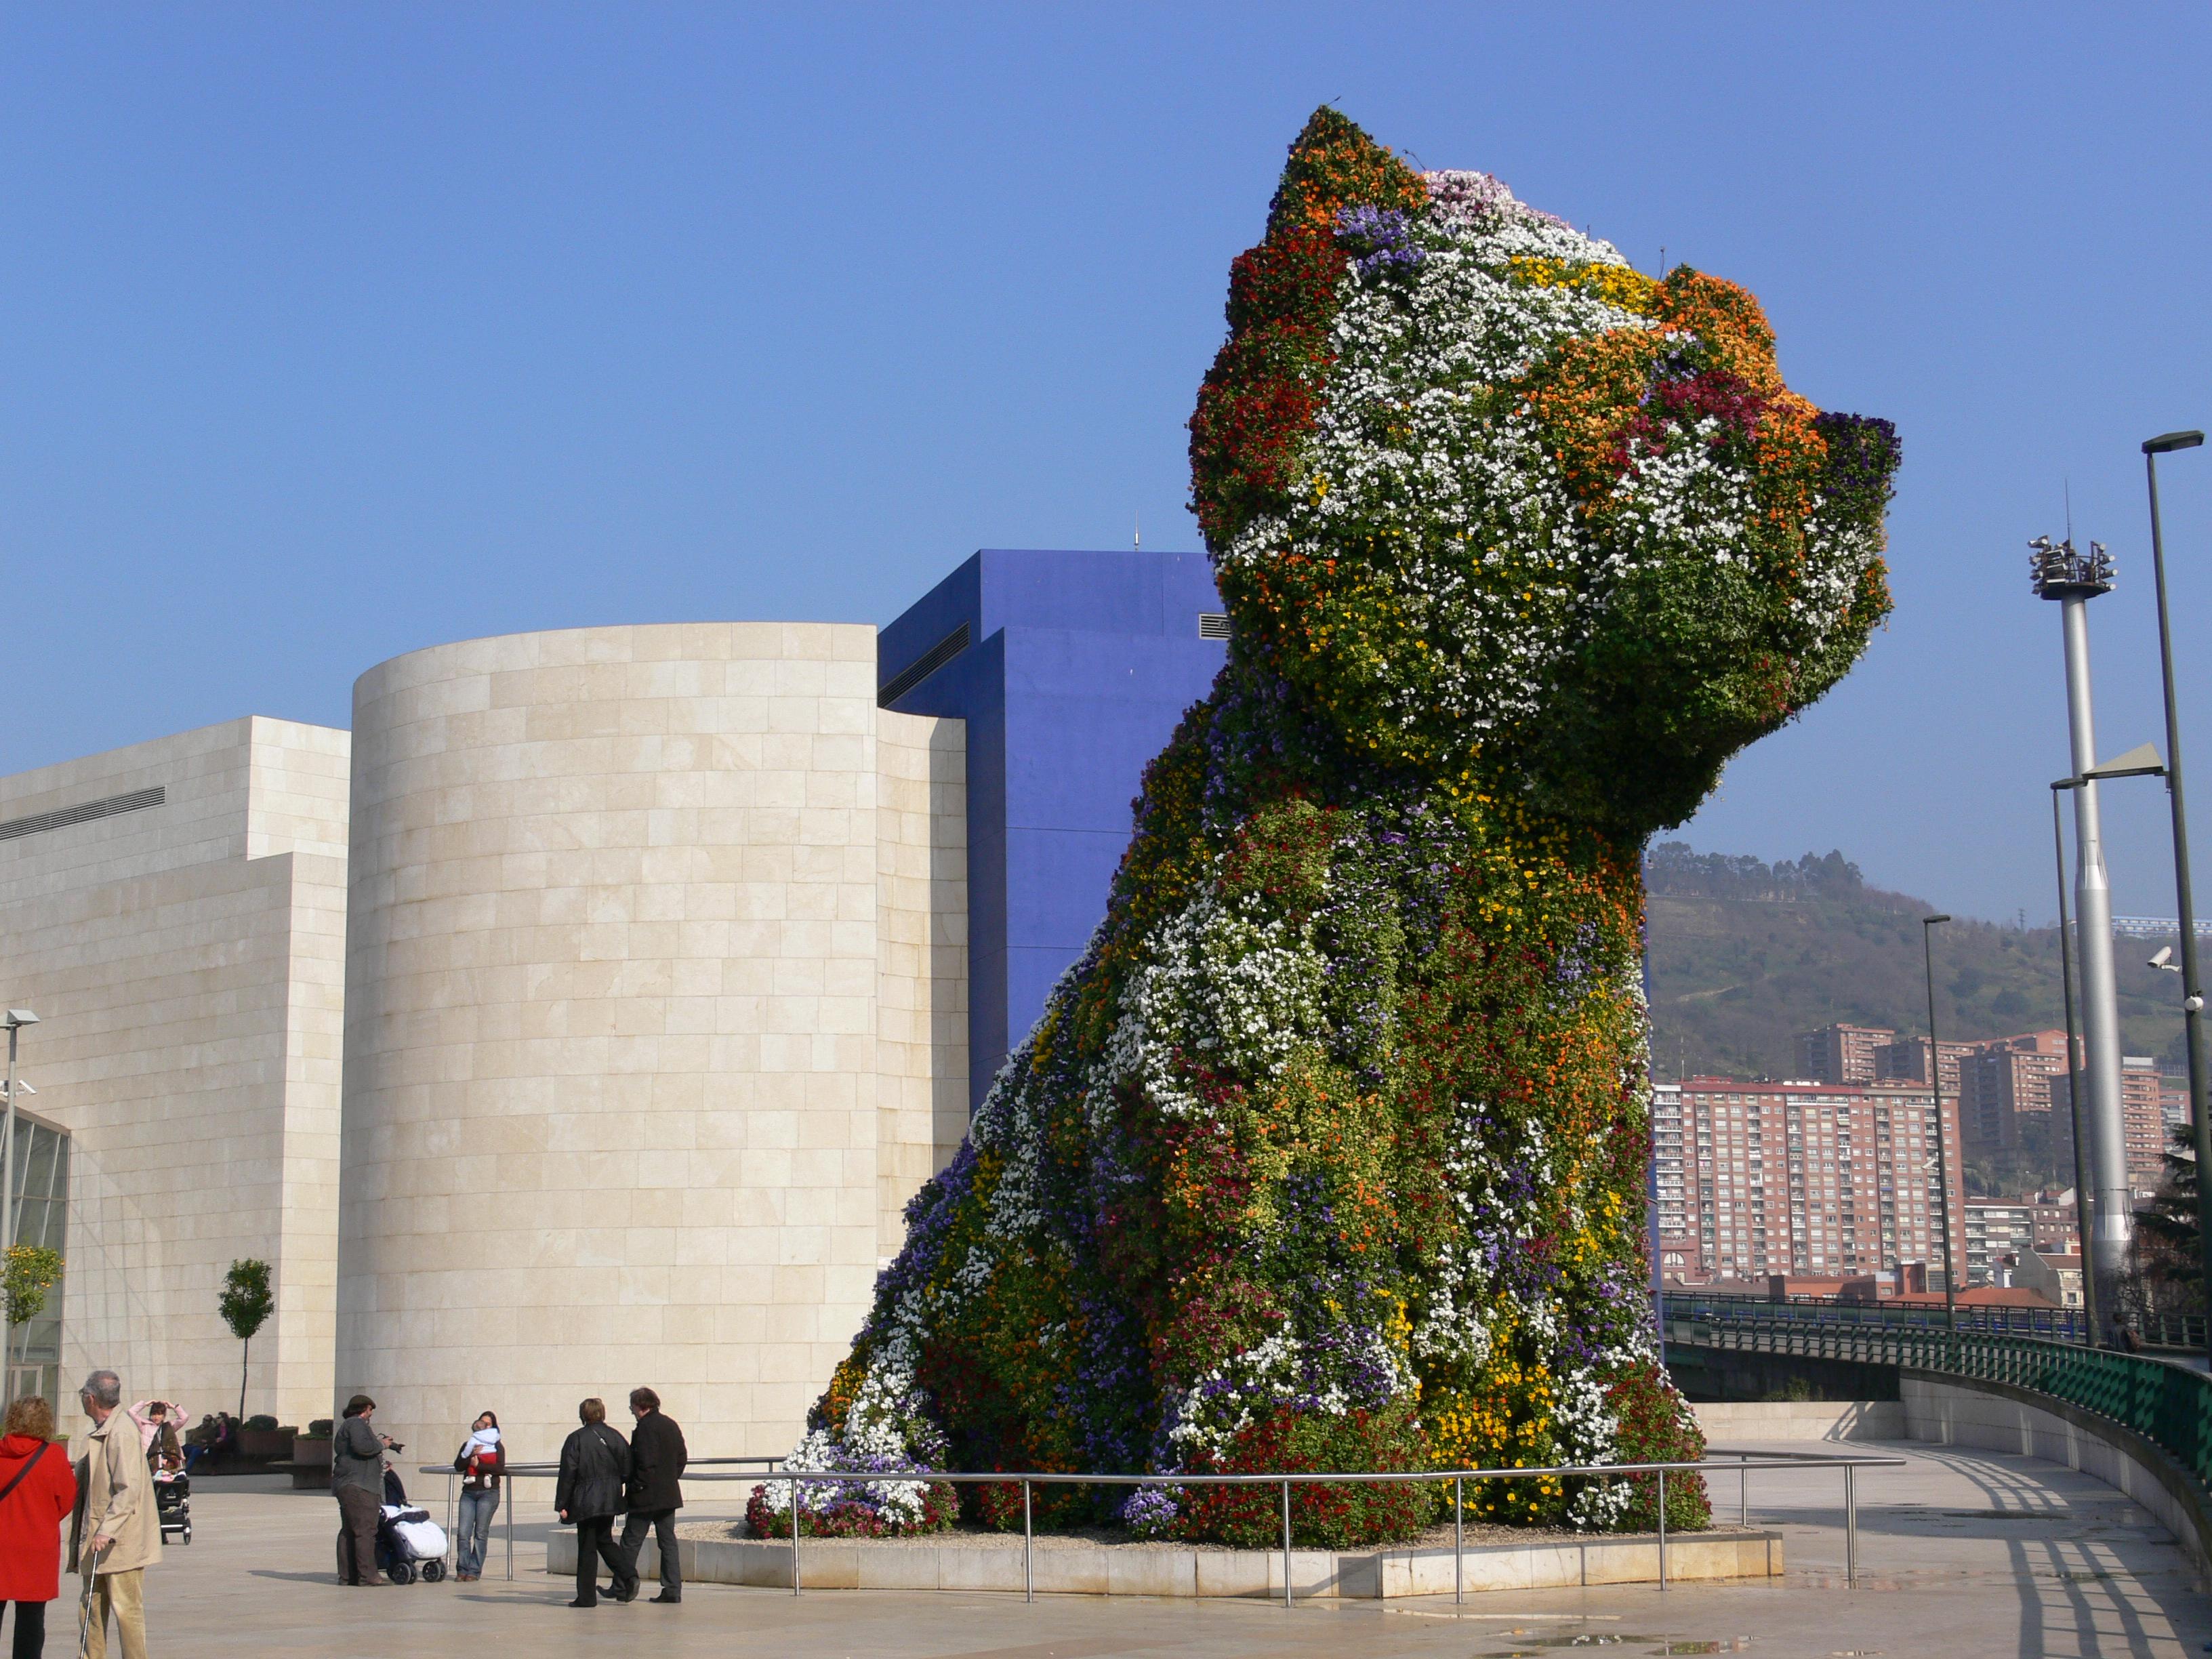 Puppy_Koons_Bilbao.jpg